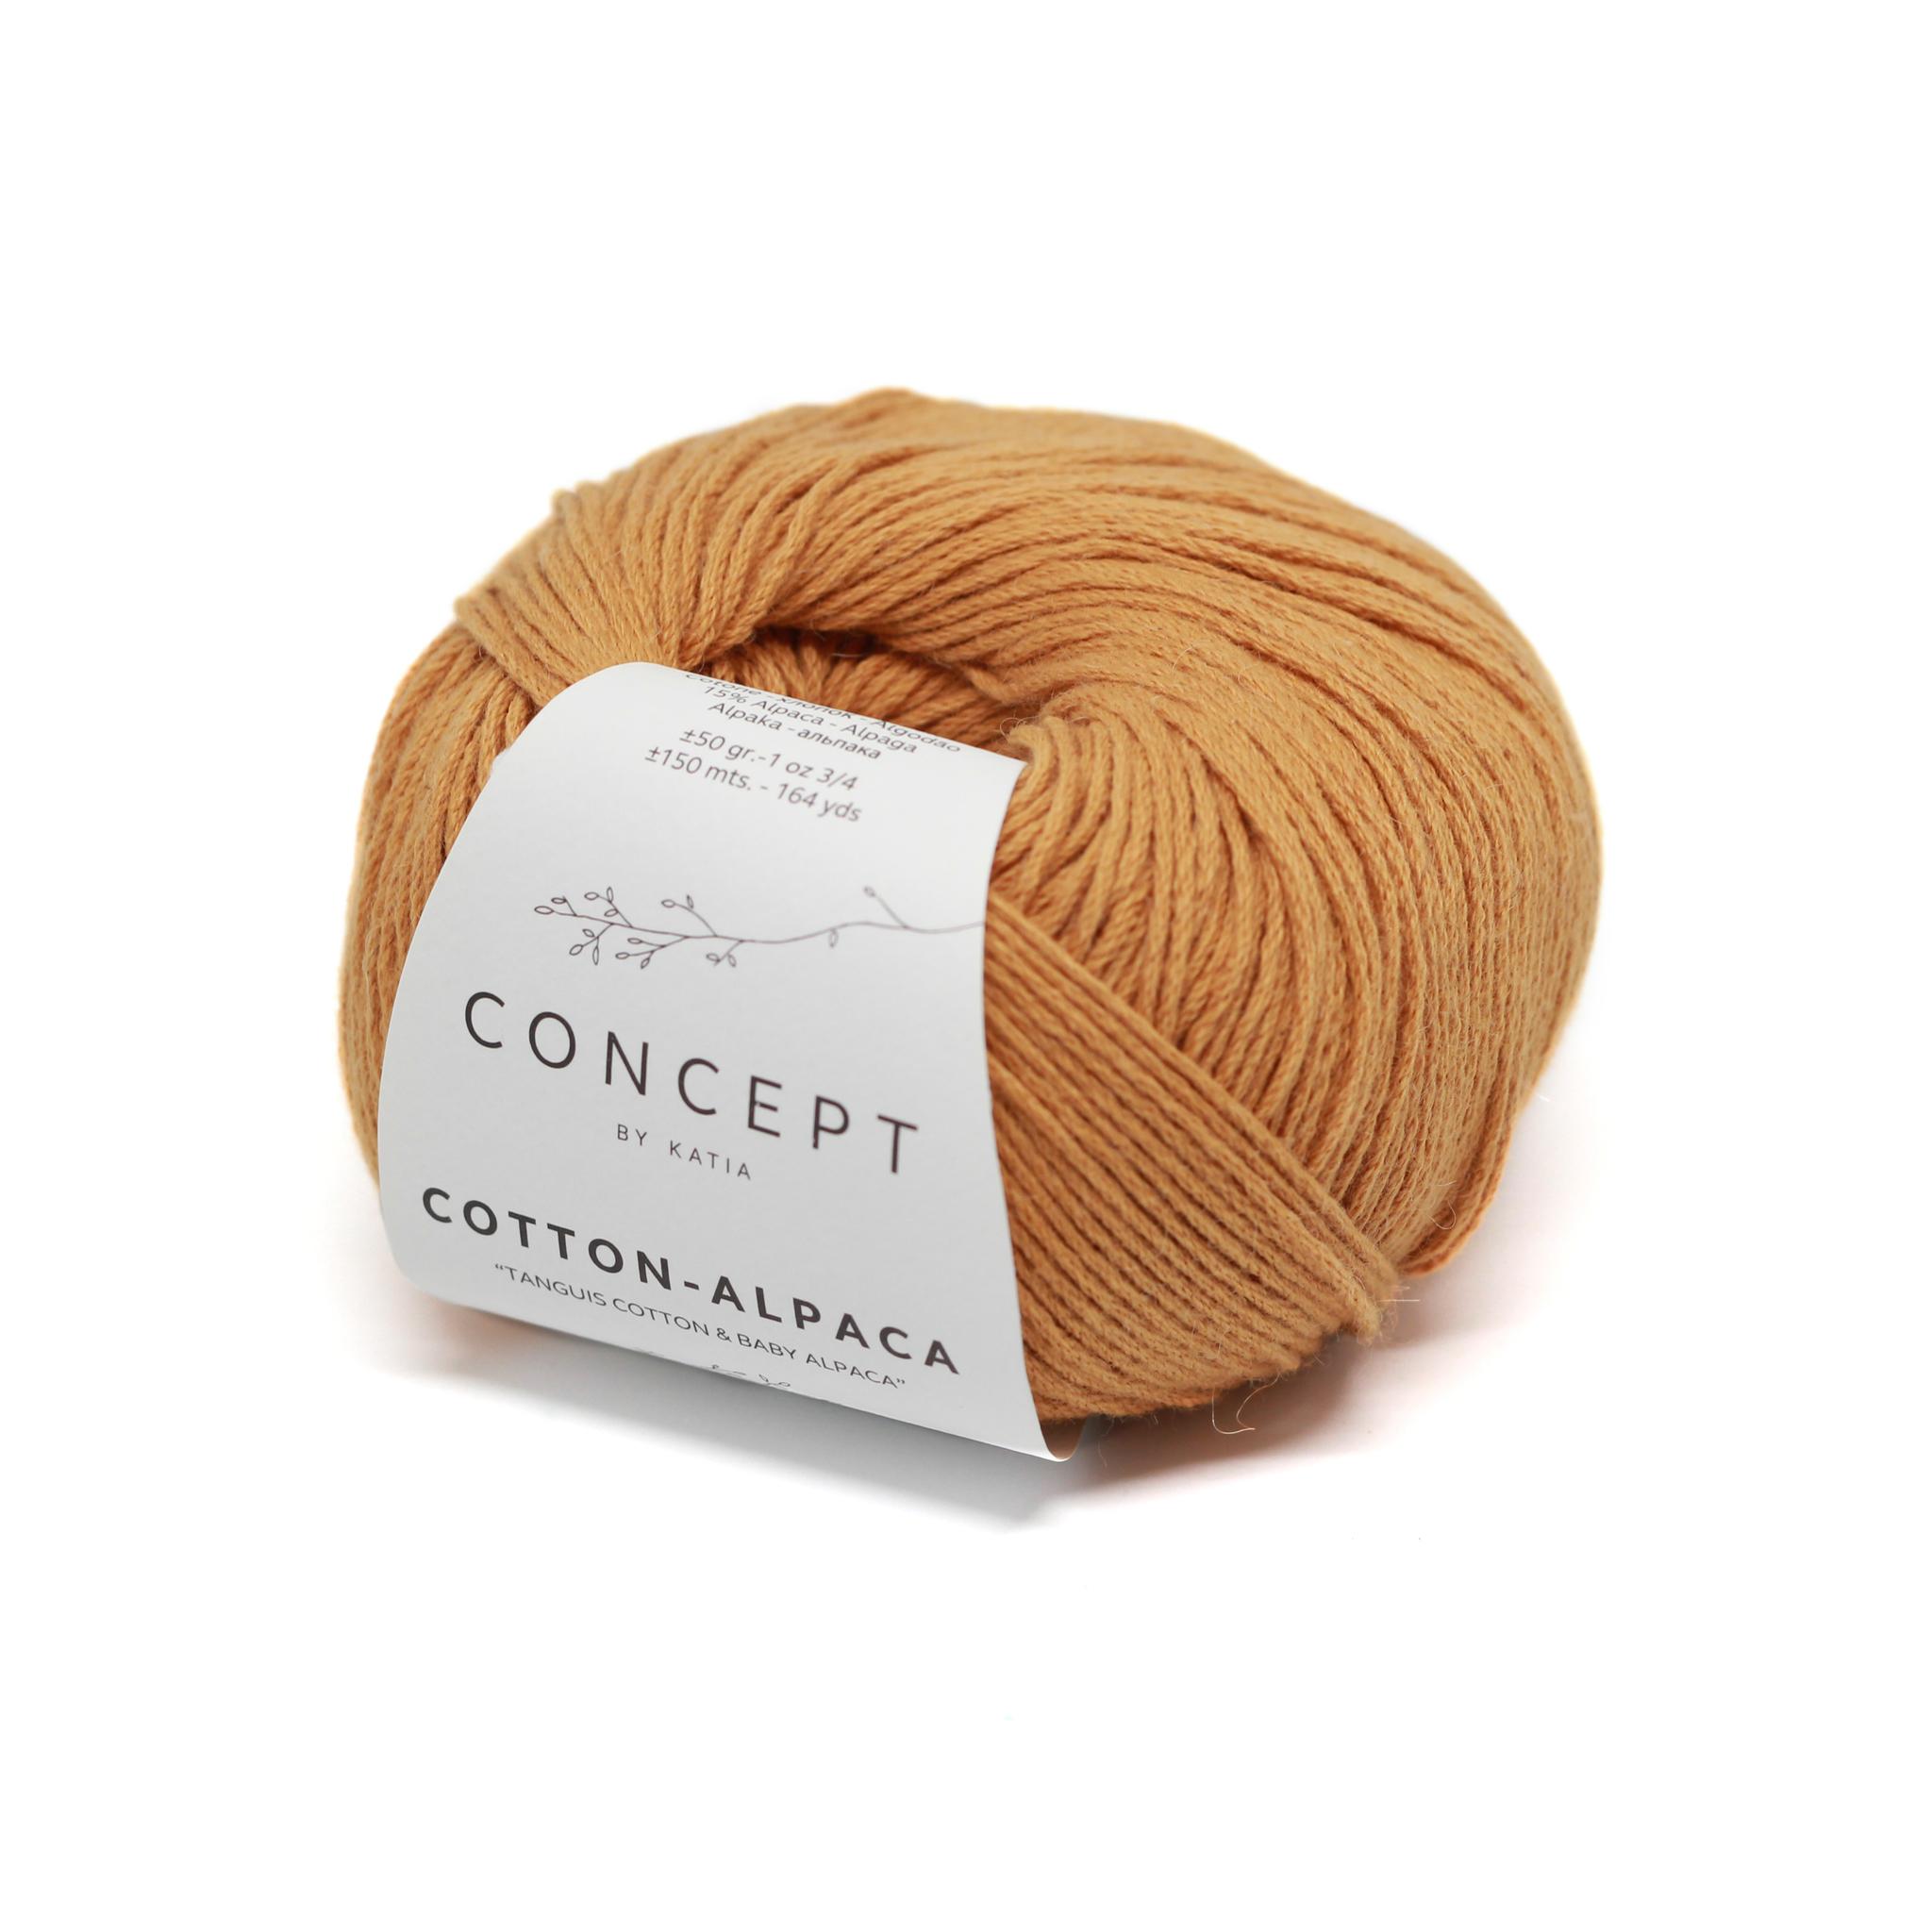 Katia Concept Cotton-Alpaca - 98